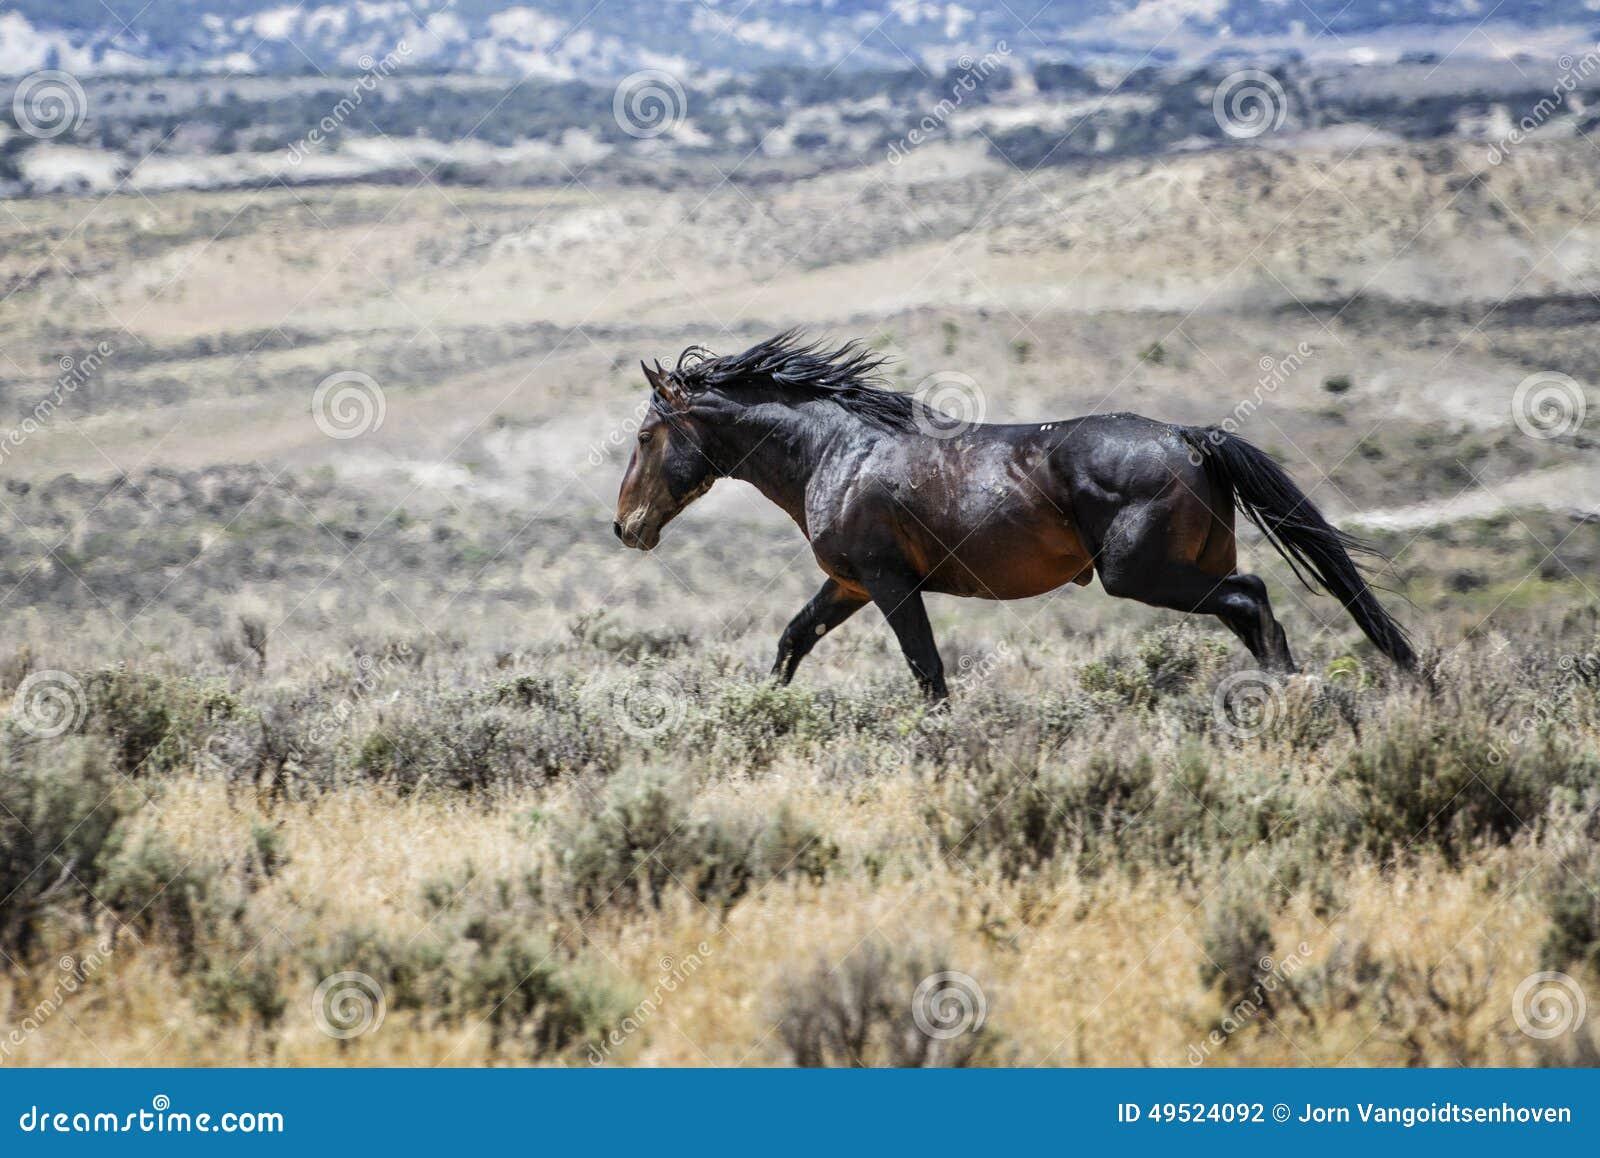 Sand Wash Basin Wild Horse Running Stock Photo Image Of Sand Basin 49524092